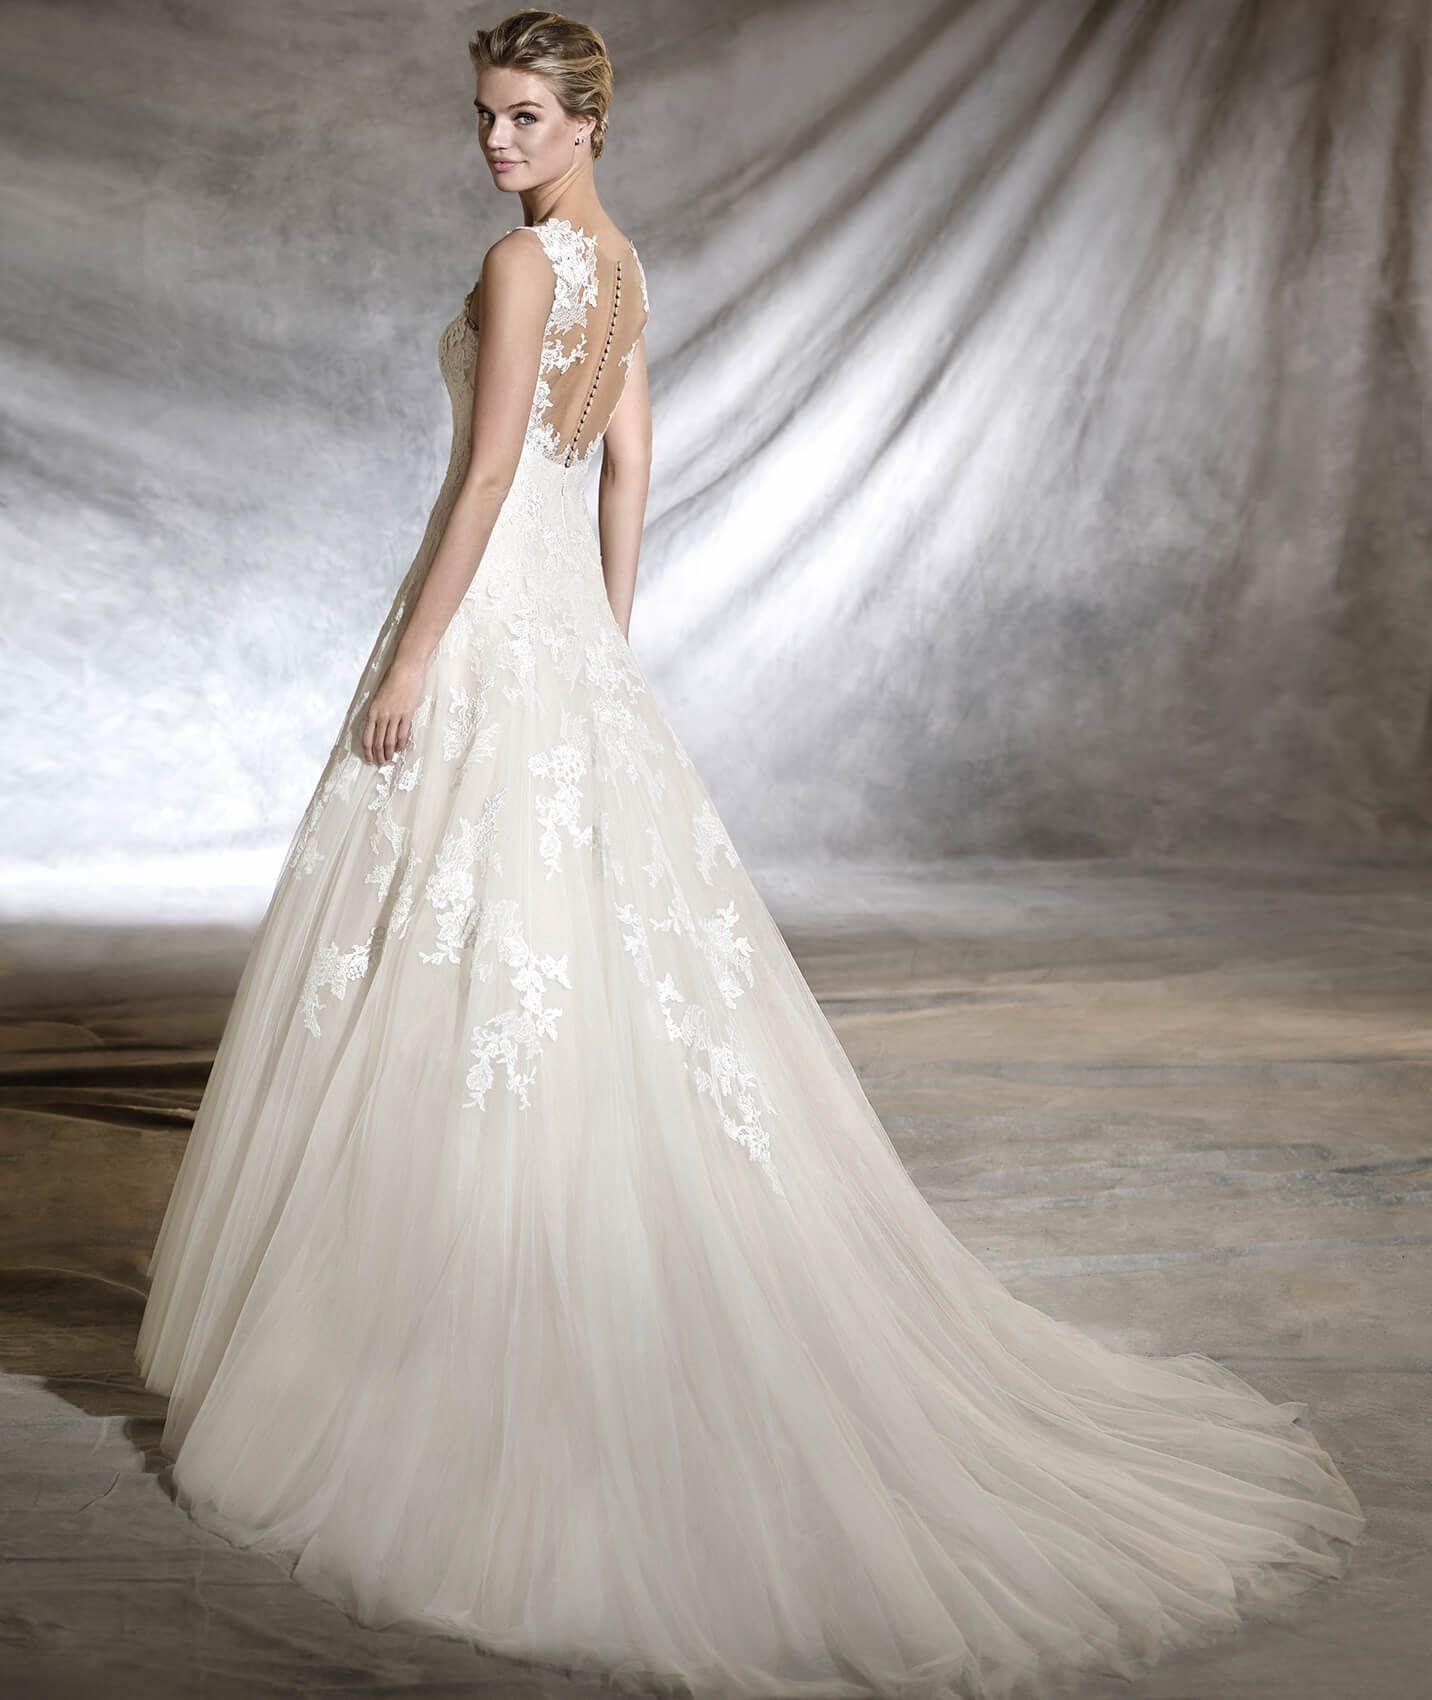 OLWEN Princess wedding dress with an A line skirt